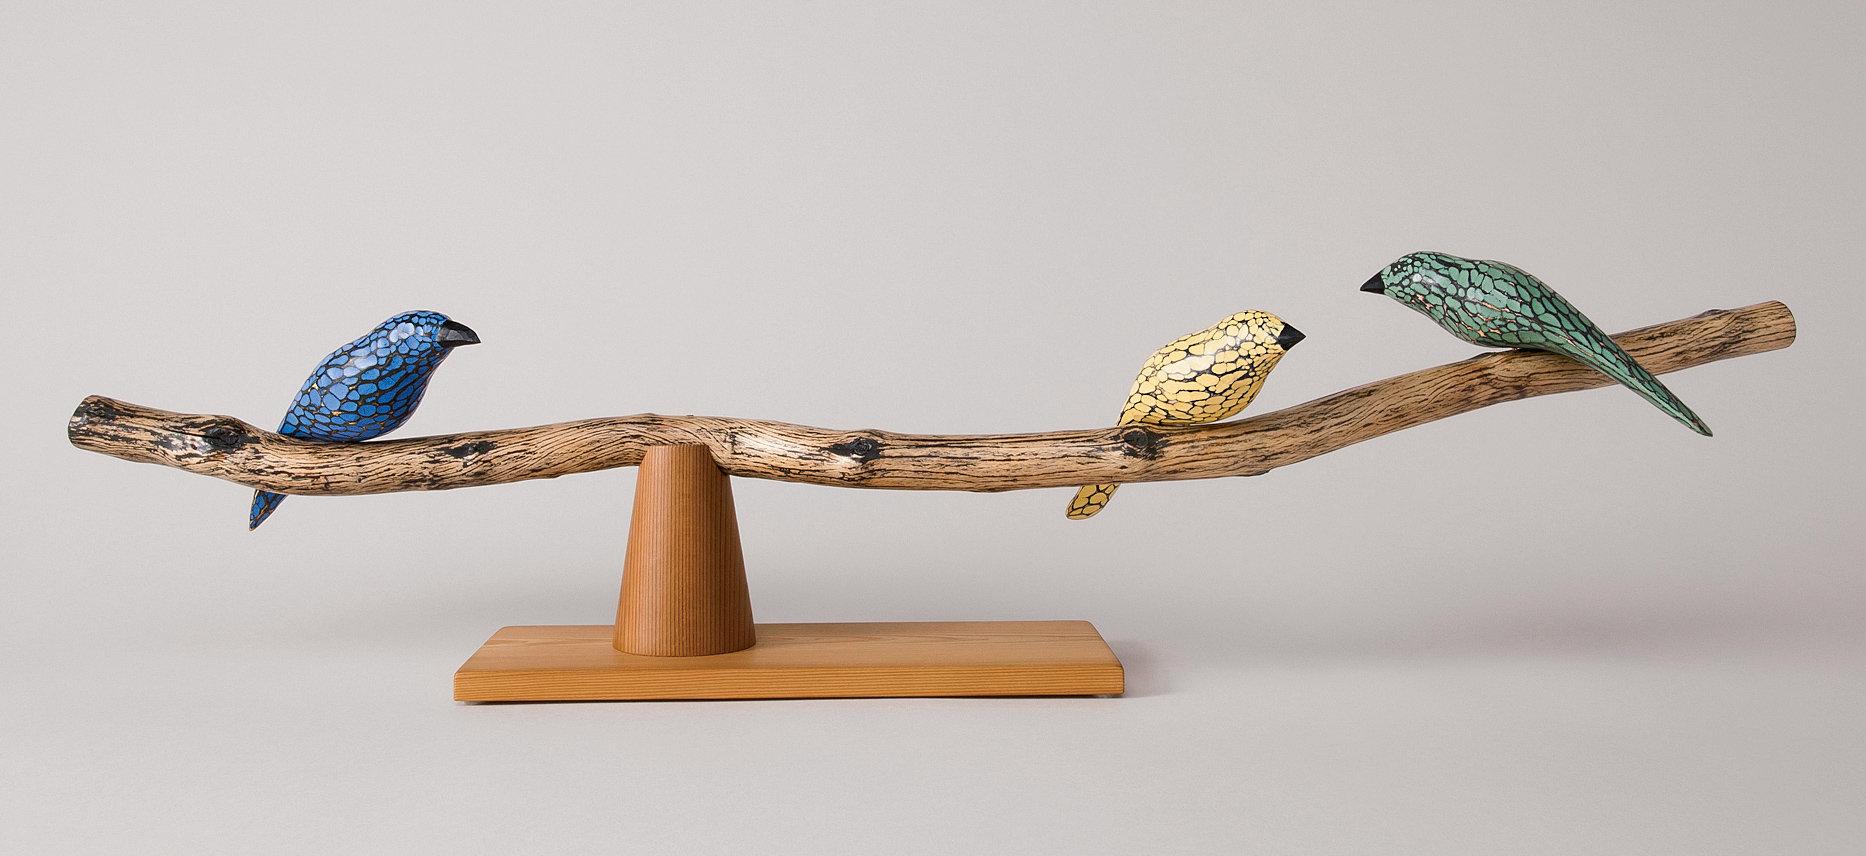 Birds On Branch By Paul Sumner Wood Sculpture Artful Home